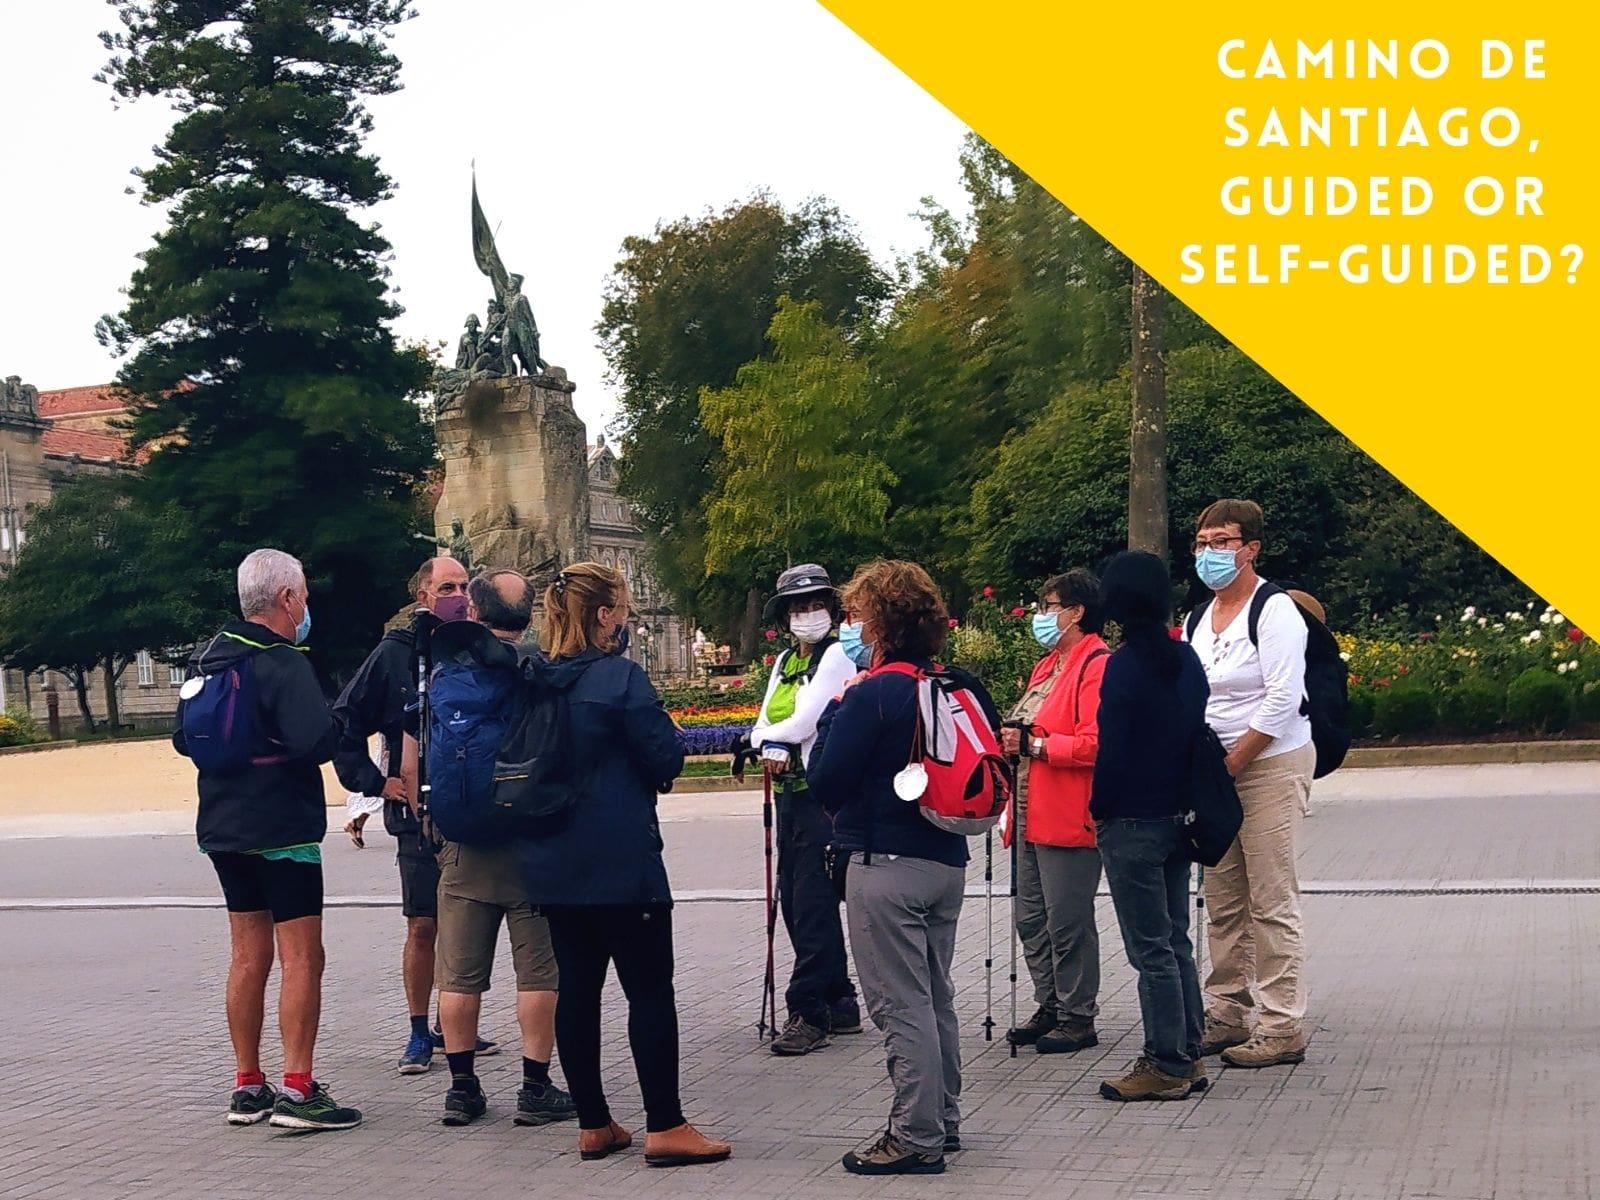 Camino de Santiago, Guided or Self-Guided?